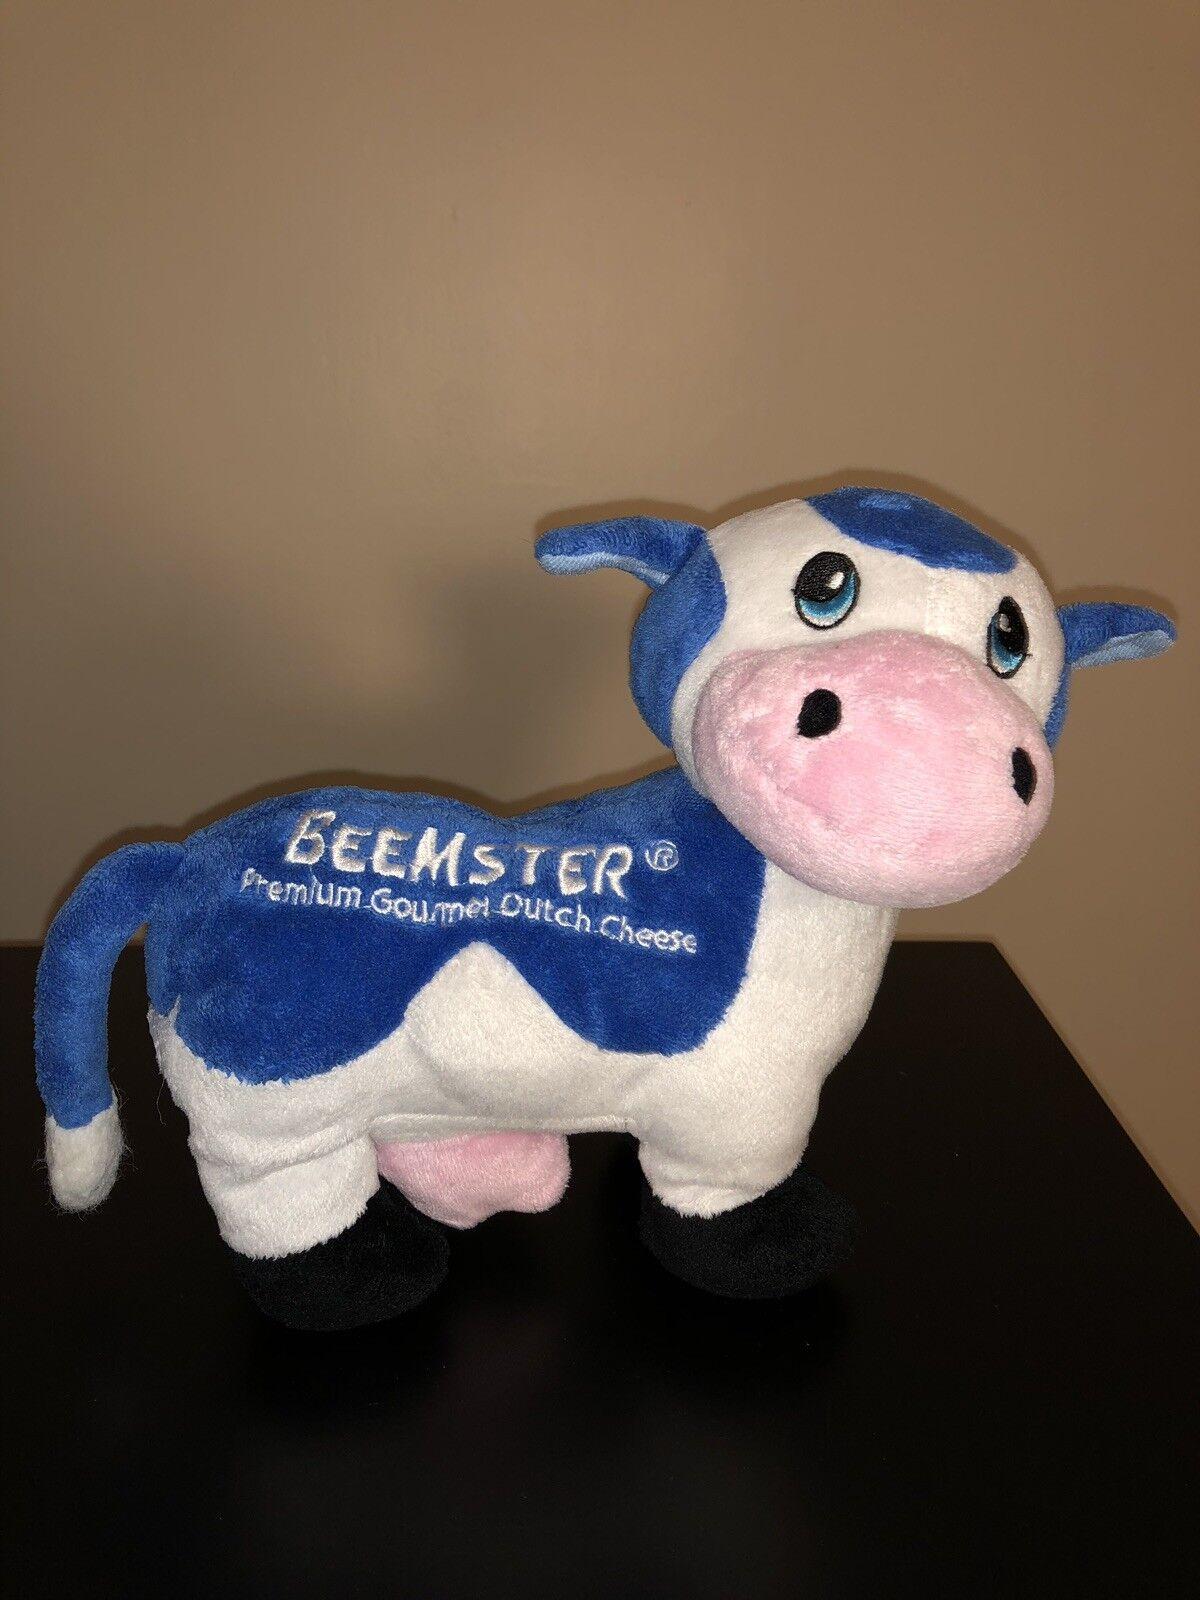 BEEMSTER CHEESE COW PREMIUM GOURMET DUTCH Blau Weiß IMPORTED DELFT Blau FarbeS